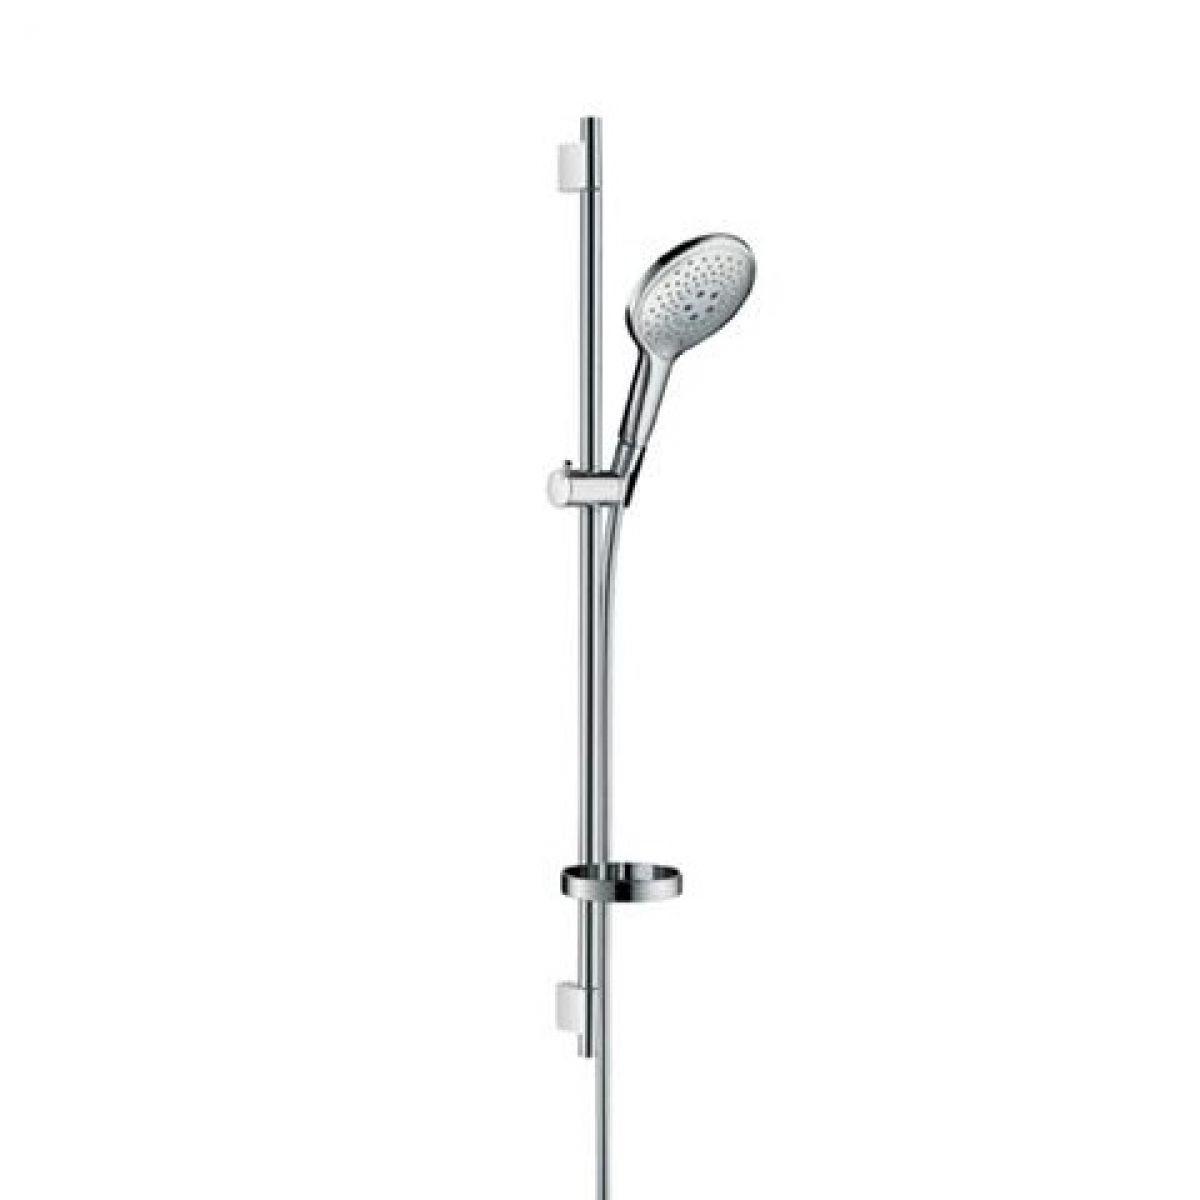 hansgrohe raindance s unica 39 s puro shower set uk bathrooms. Black Bedroom Furniture Sets. Home Design Ideas